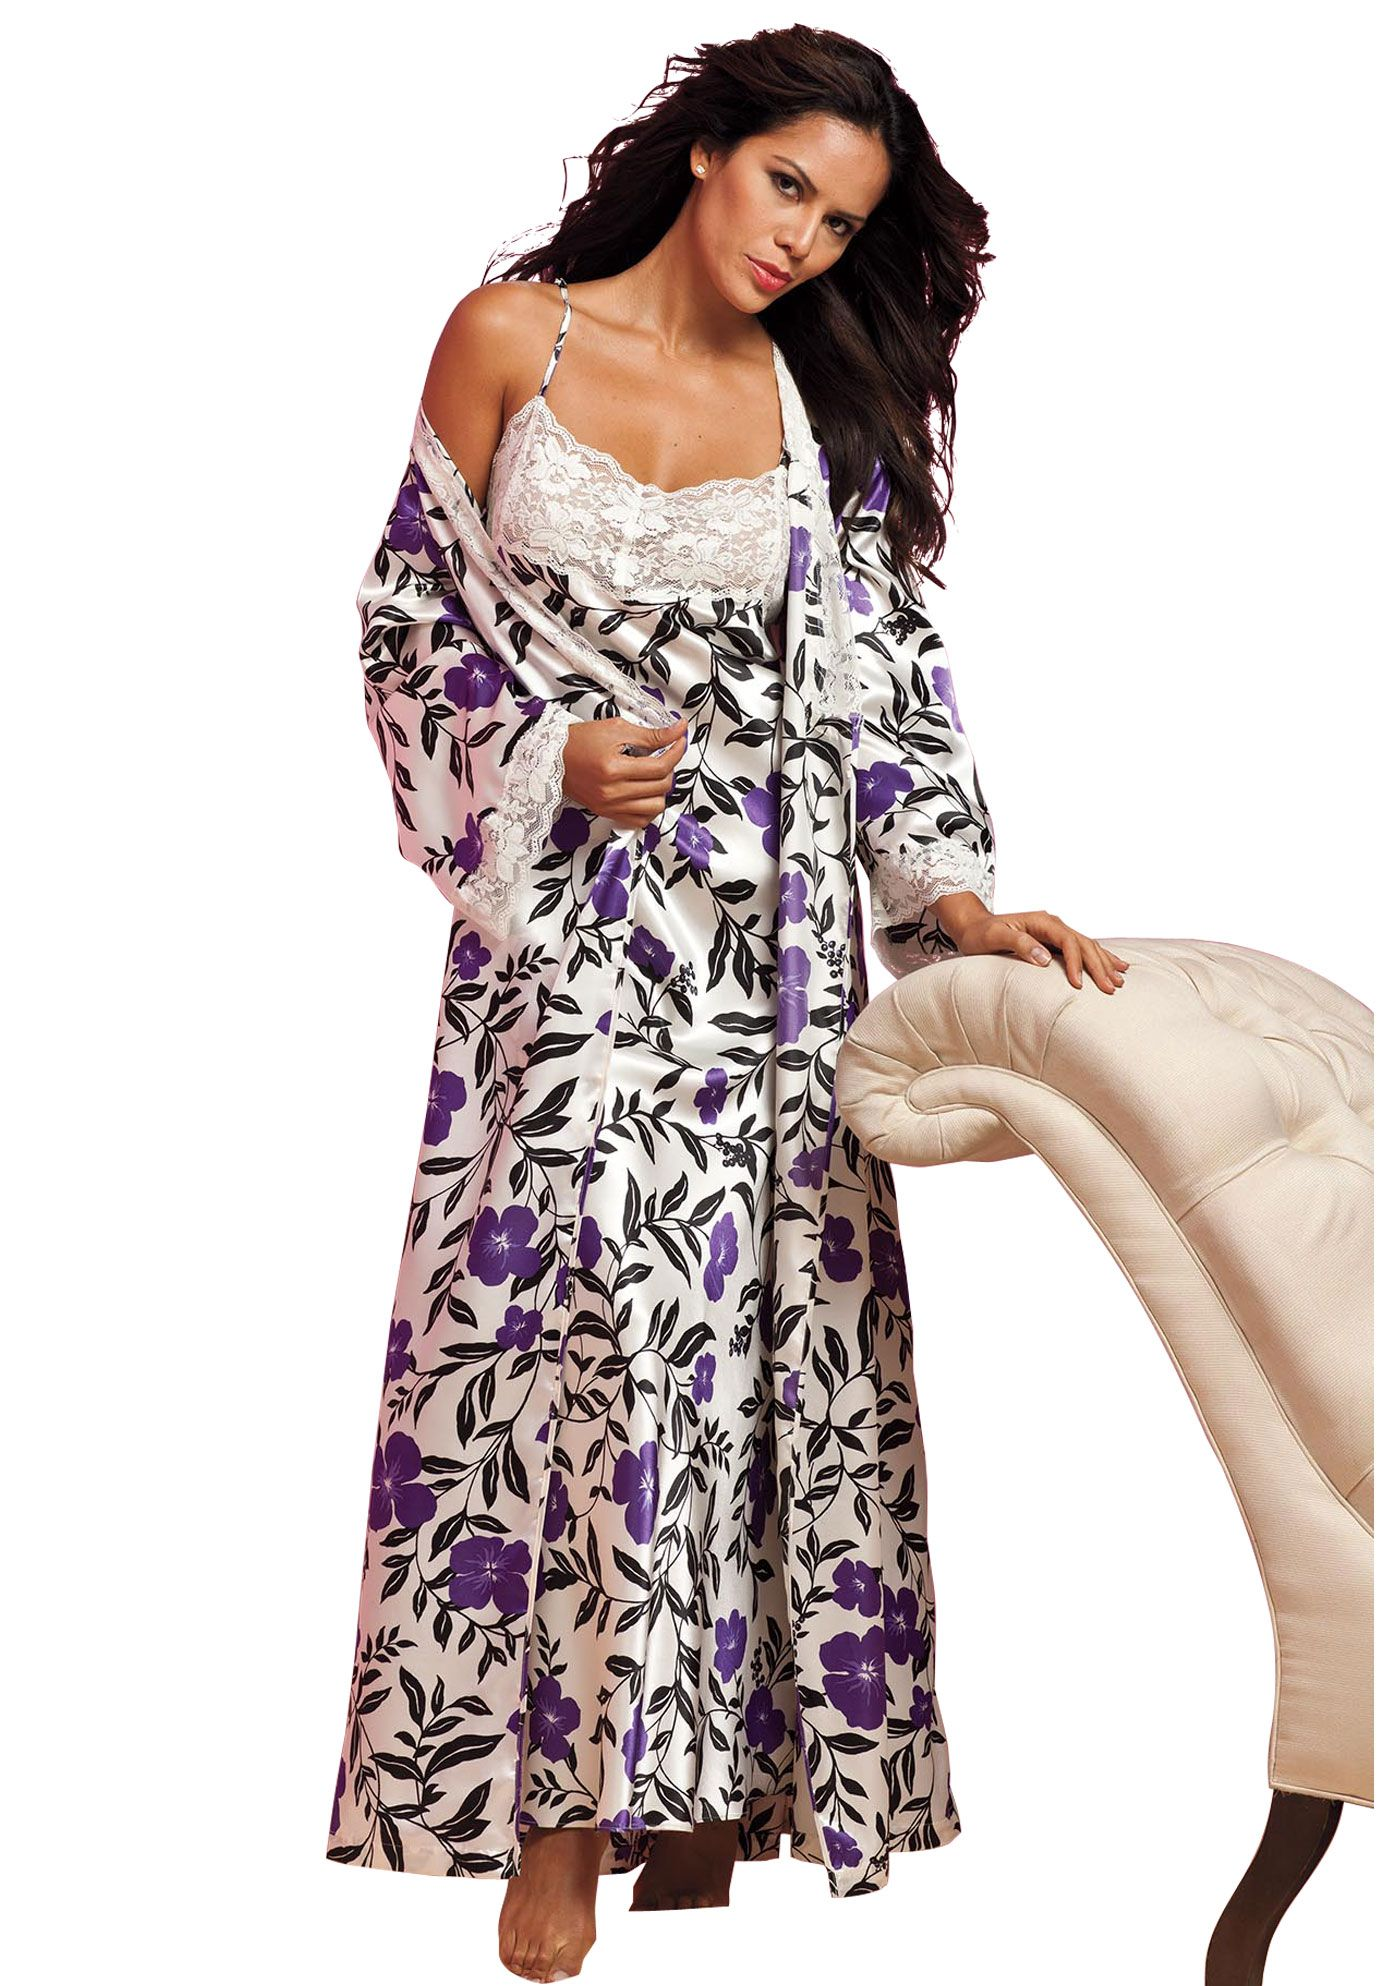 0d8bdc9744 Plus Size Clothing - Fashion for Plus Size women at Roaman s